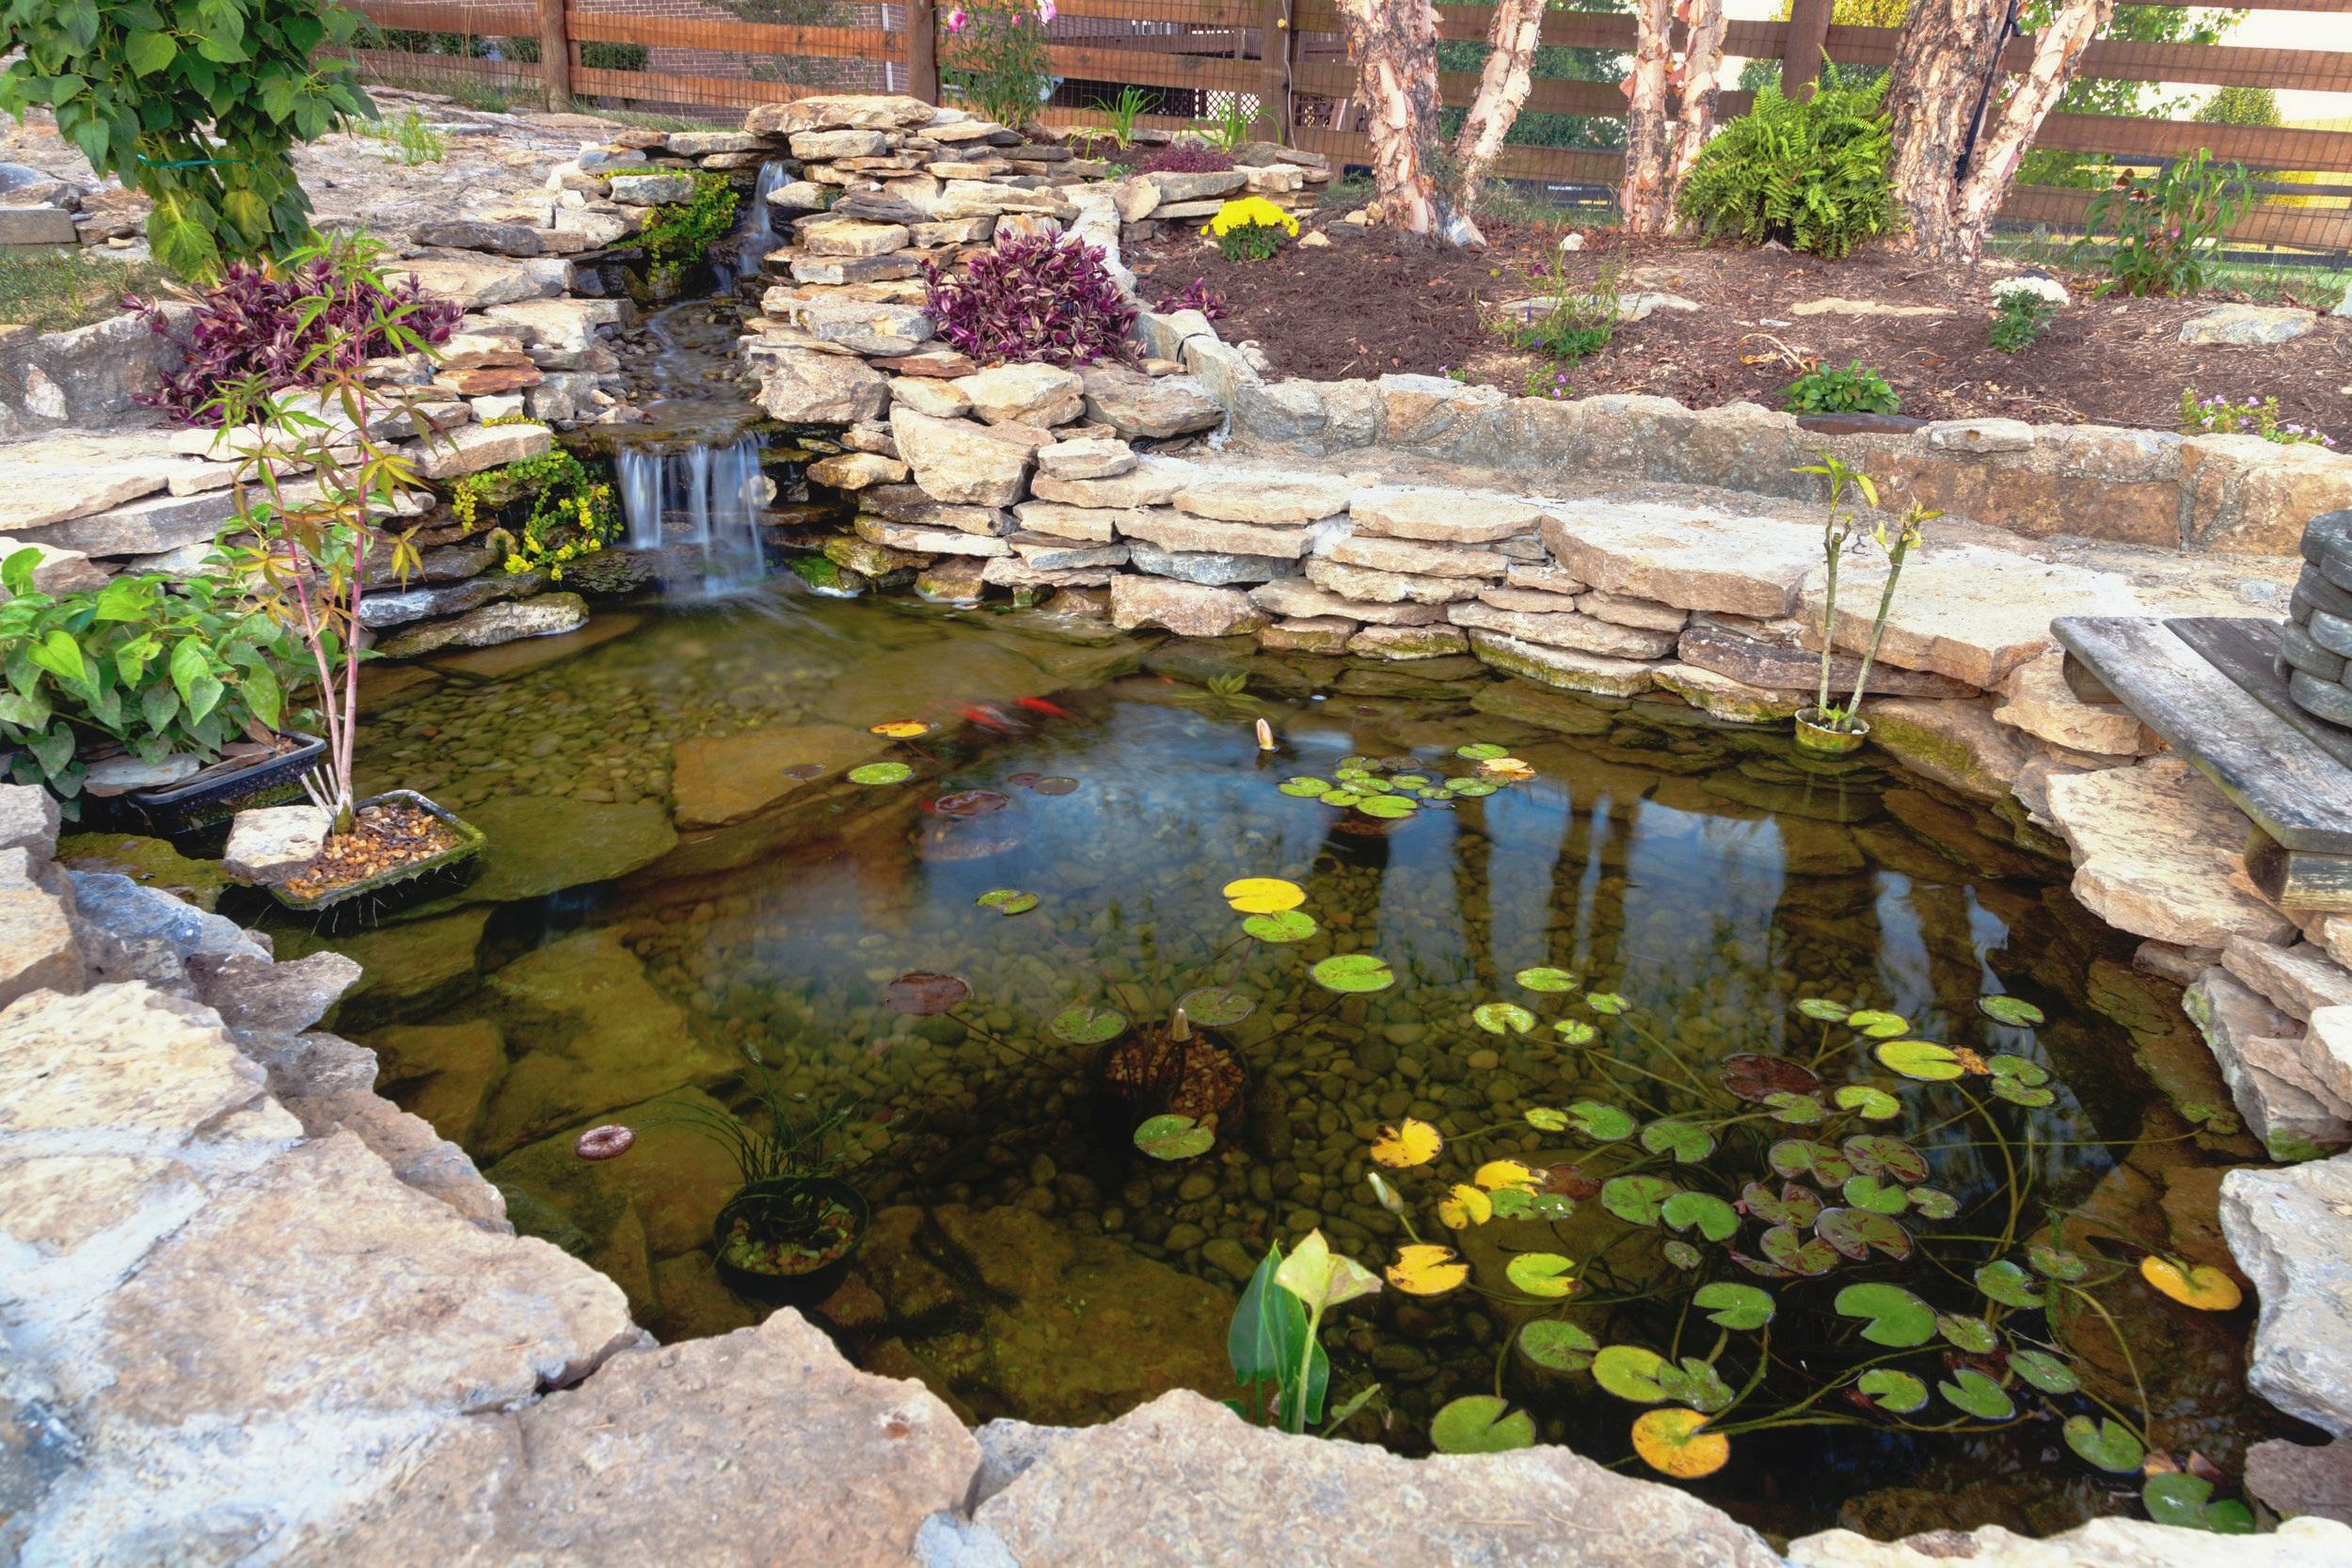 london-ontario-best-landscaper-design-landscaping-patio-driveway-deck-hunter-home-garden-05.jpg